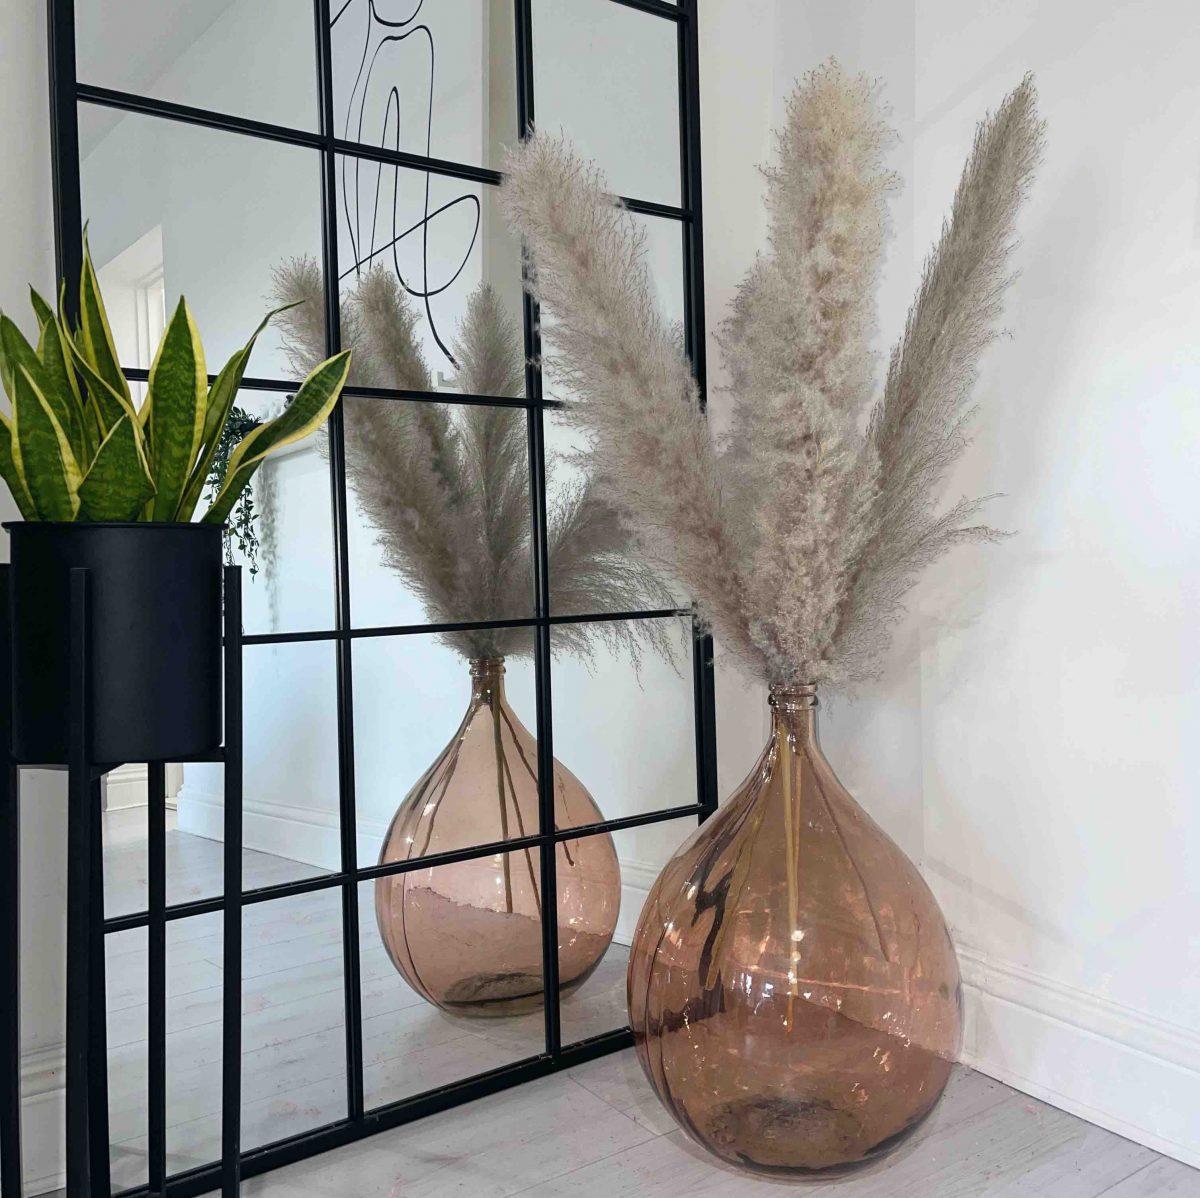 graige pampas, grey pampas, fluffy pampas, tall pampas, pampas decor, dried pampas, dried flowers , recycled glass vase